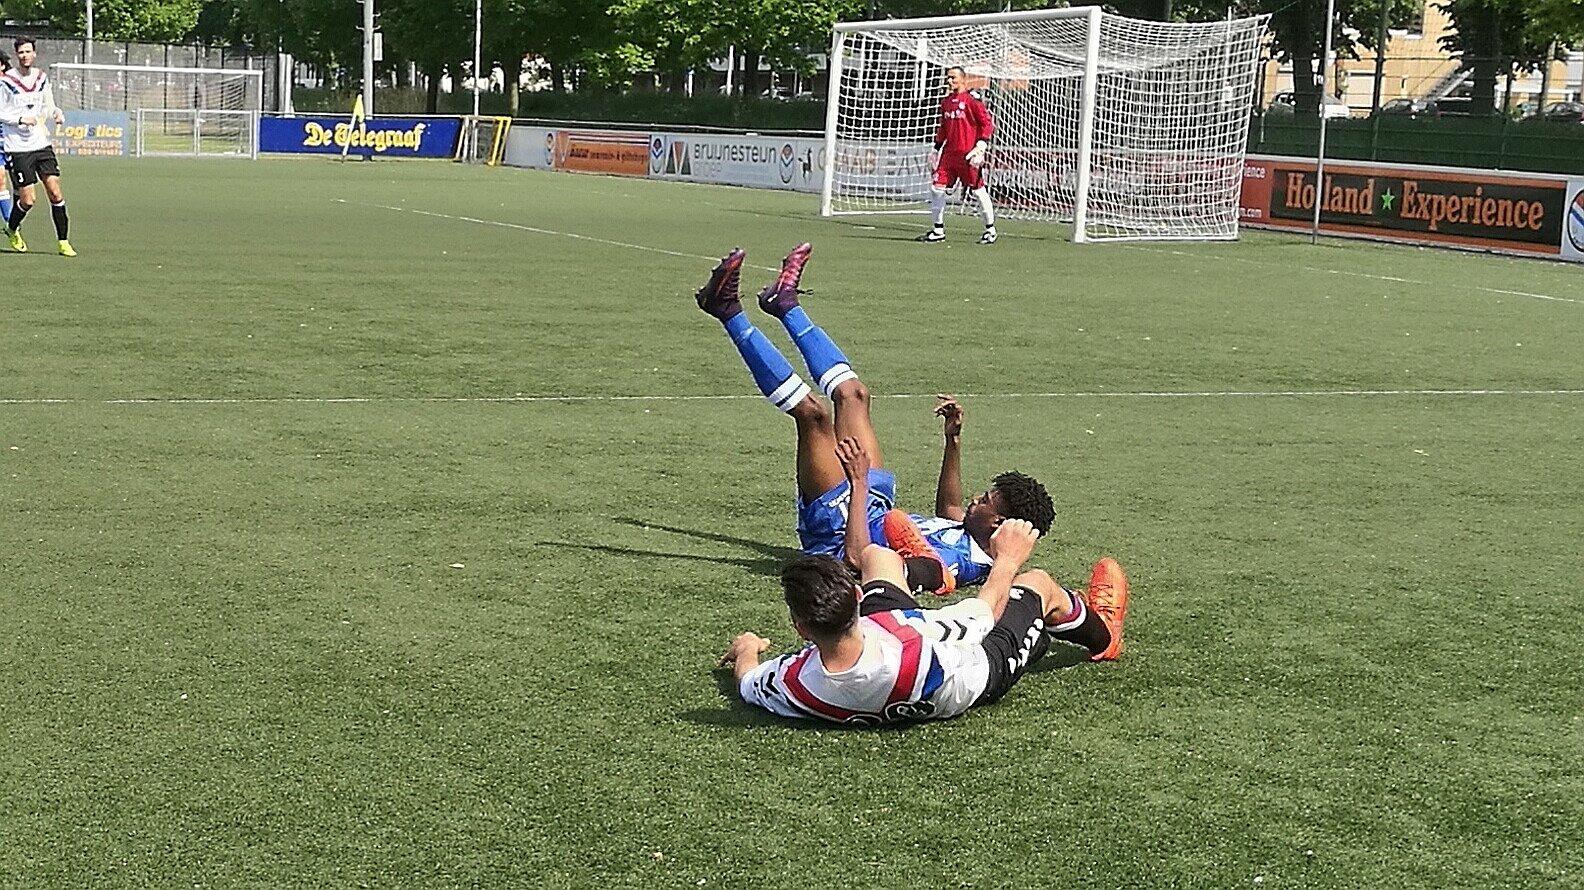 DCG - United/DAVO - Voetbal in Haarlem